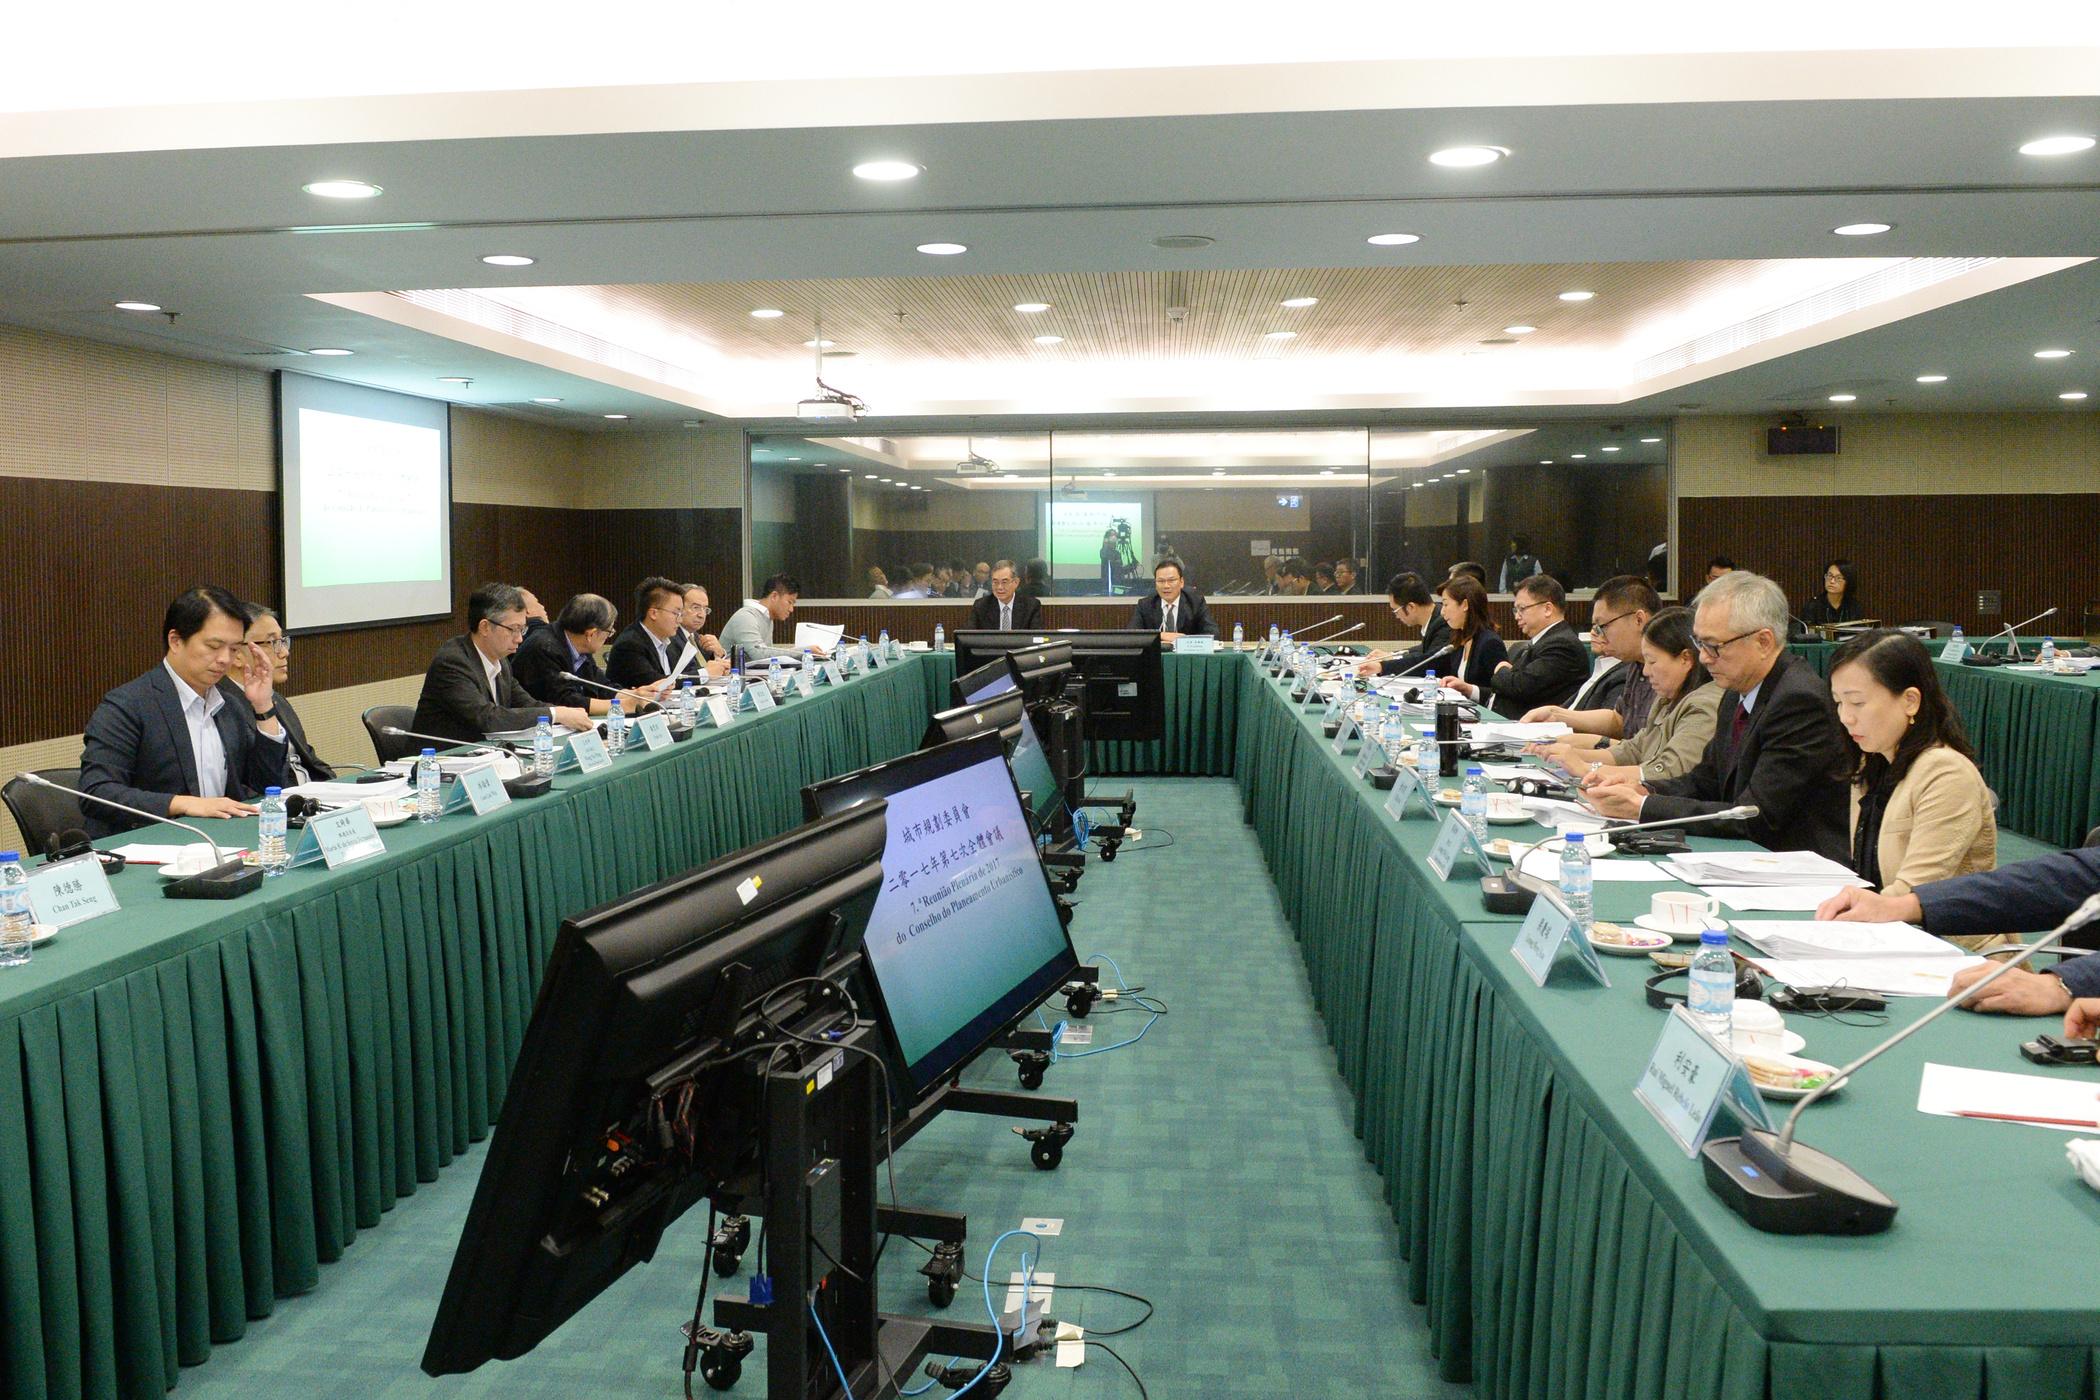 Hotel Palácio Imperial Beijing | DSSOPT promete ouvir opiniões